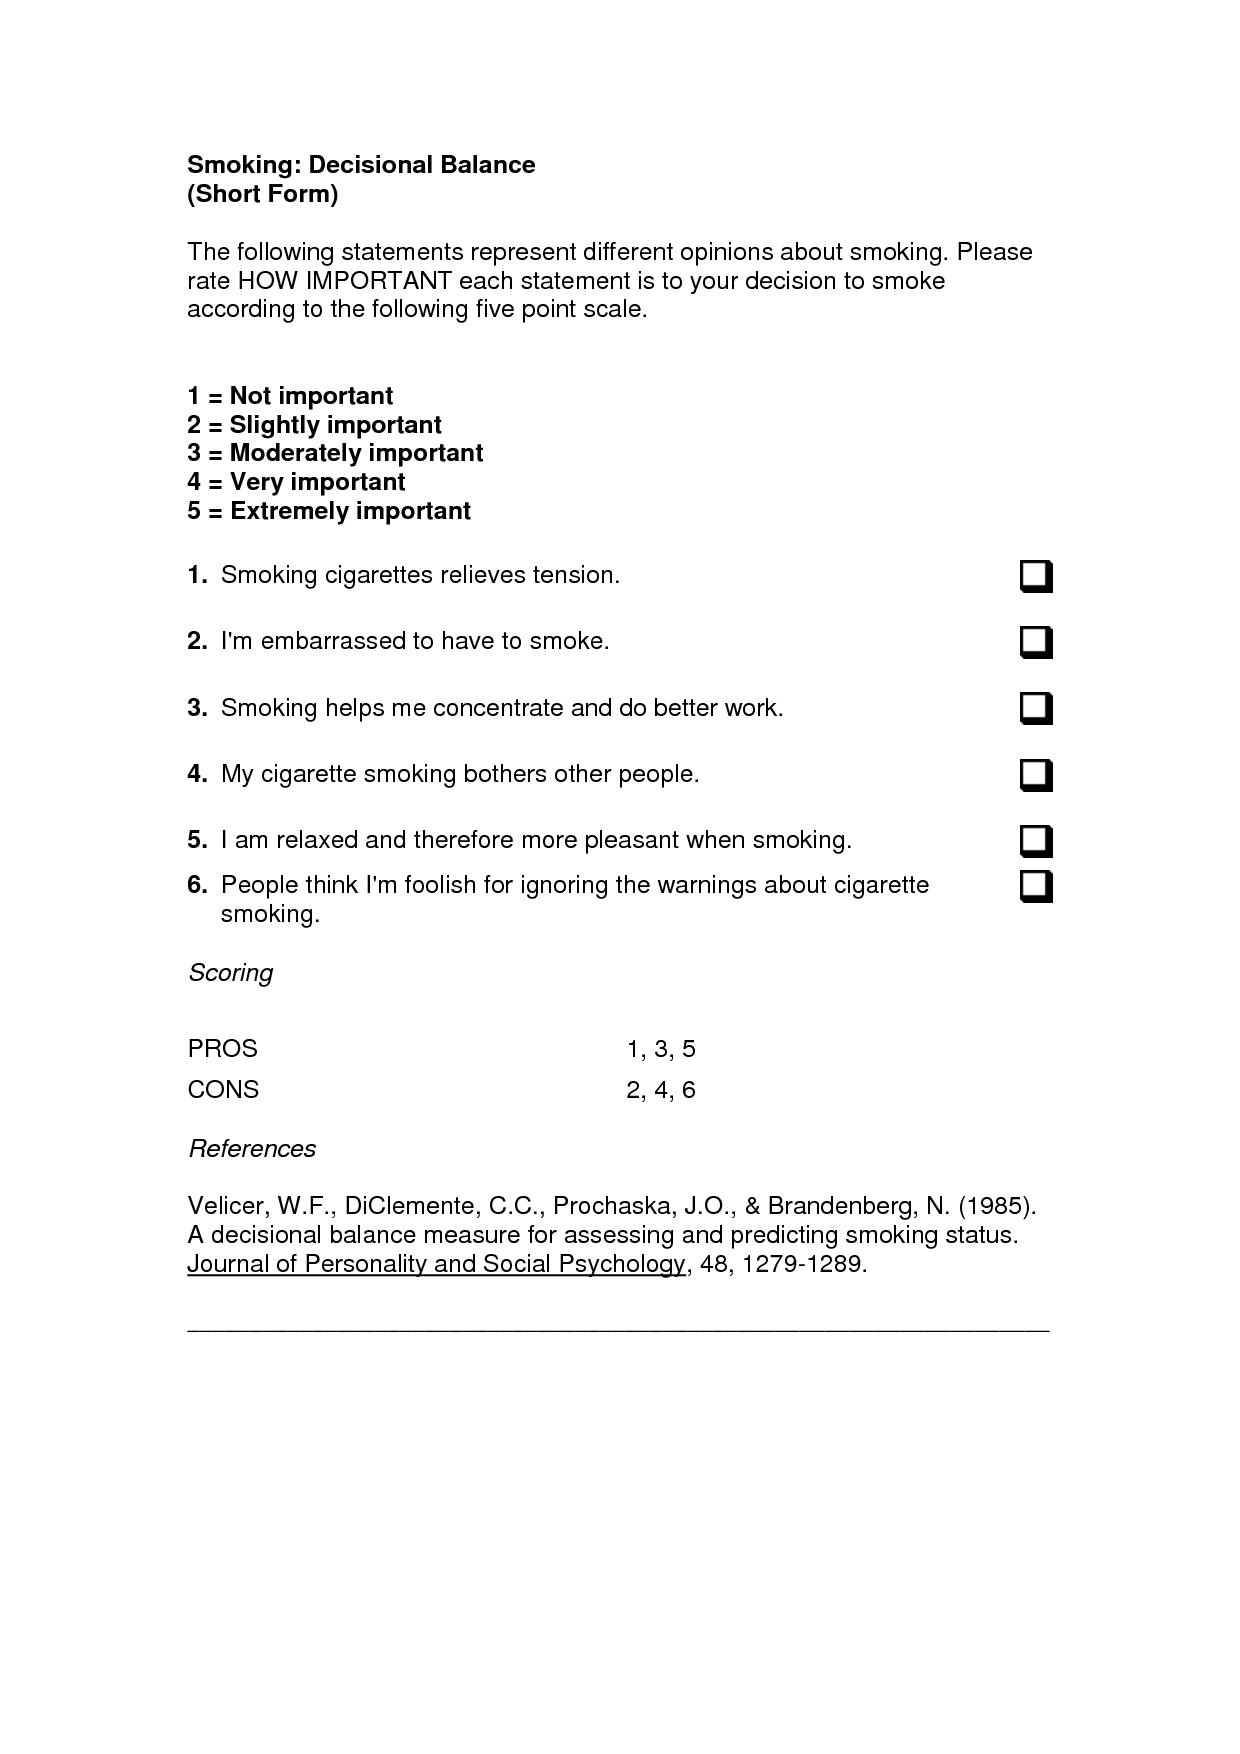 Motivational Interviewing Substance Worksheet